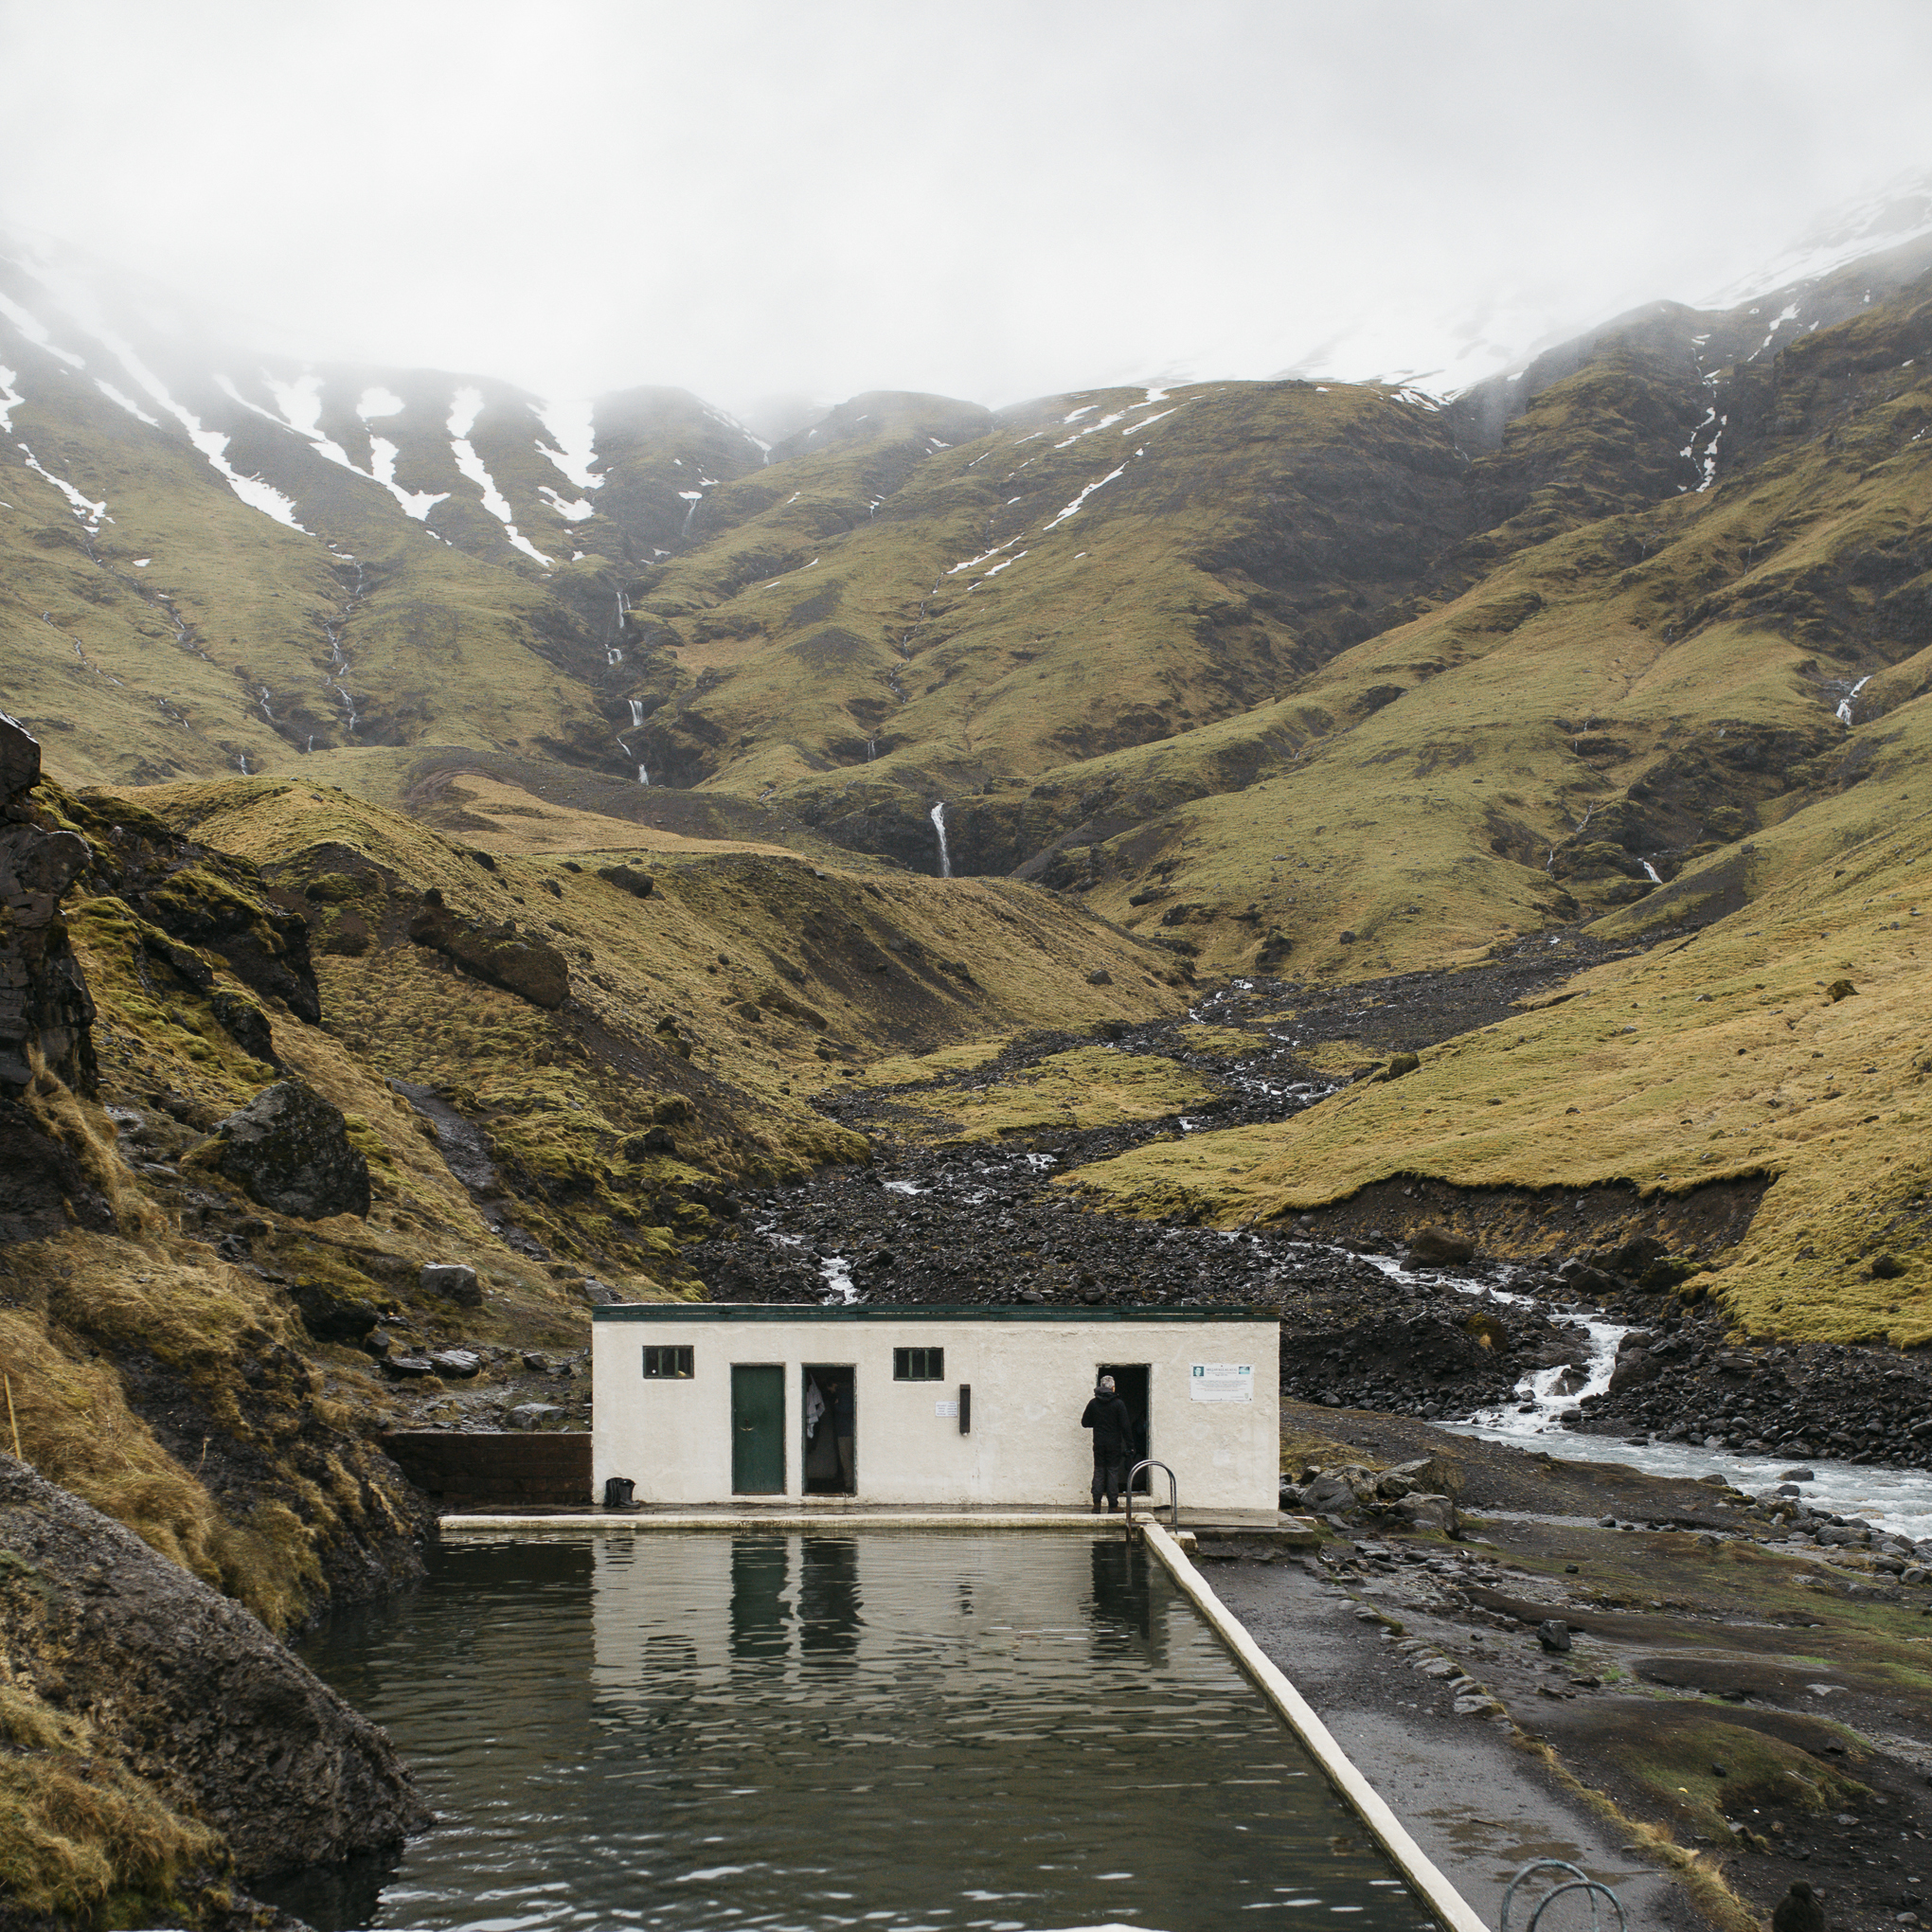 Categories: Honeymoon-Honeymoon Issue 8 - Iceland